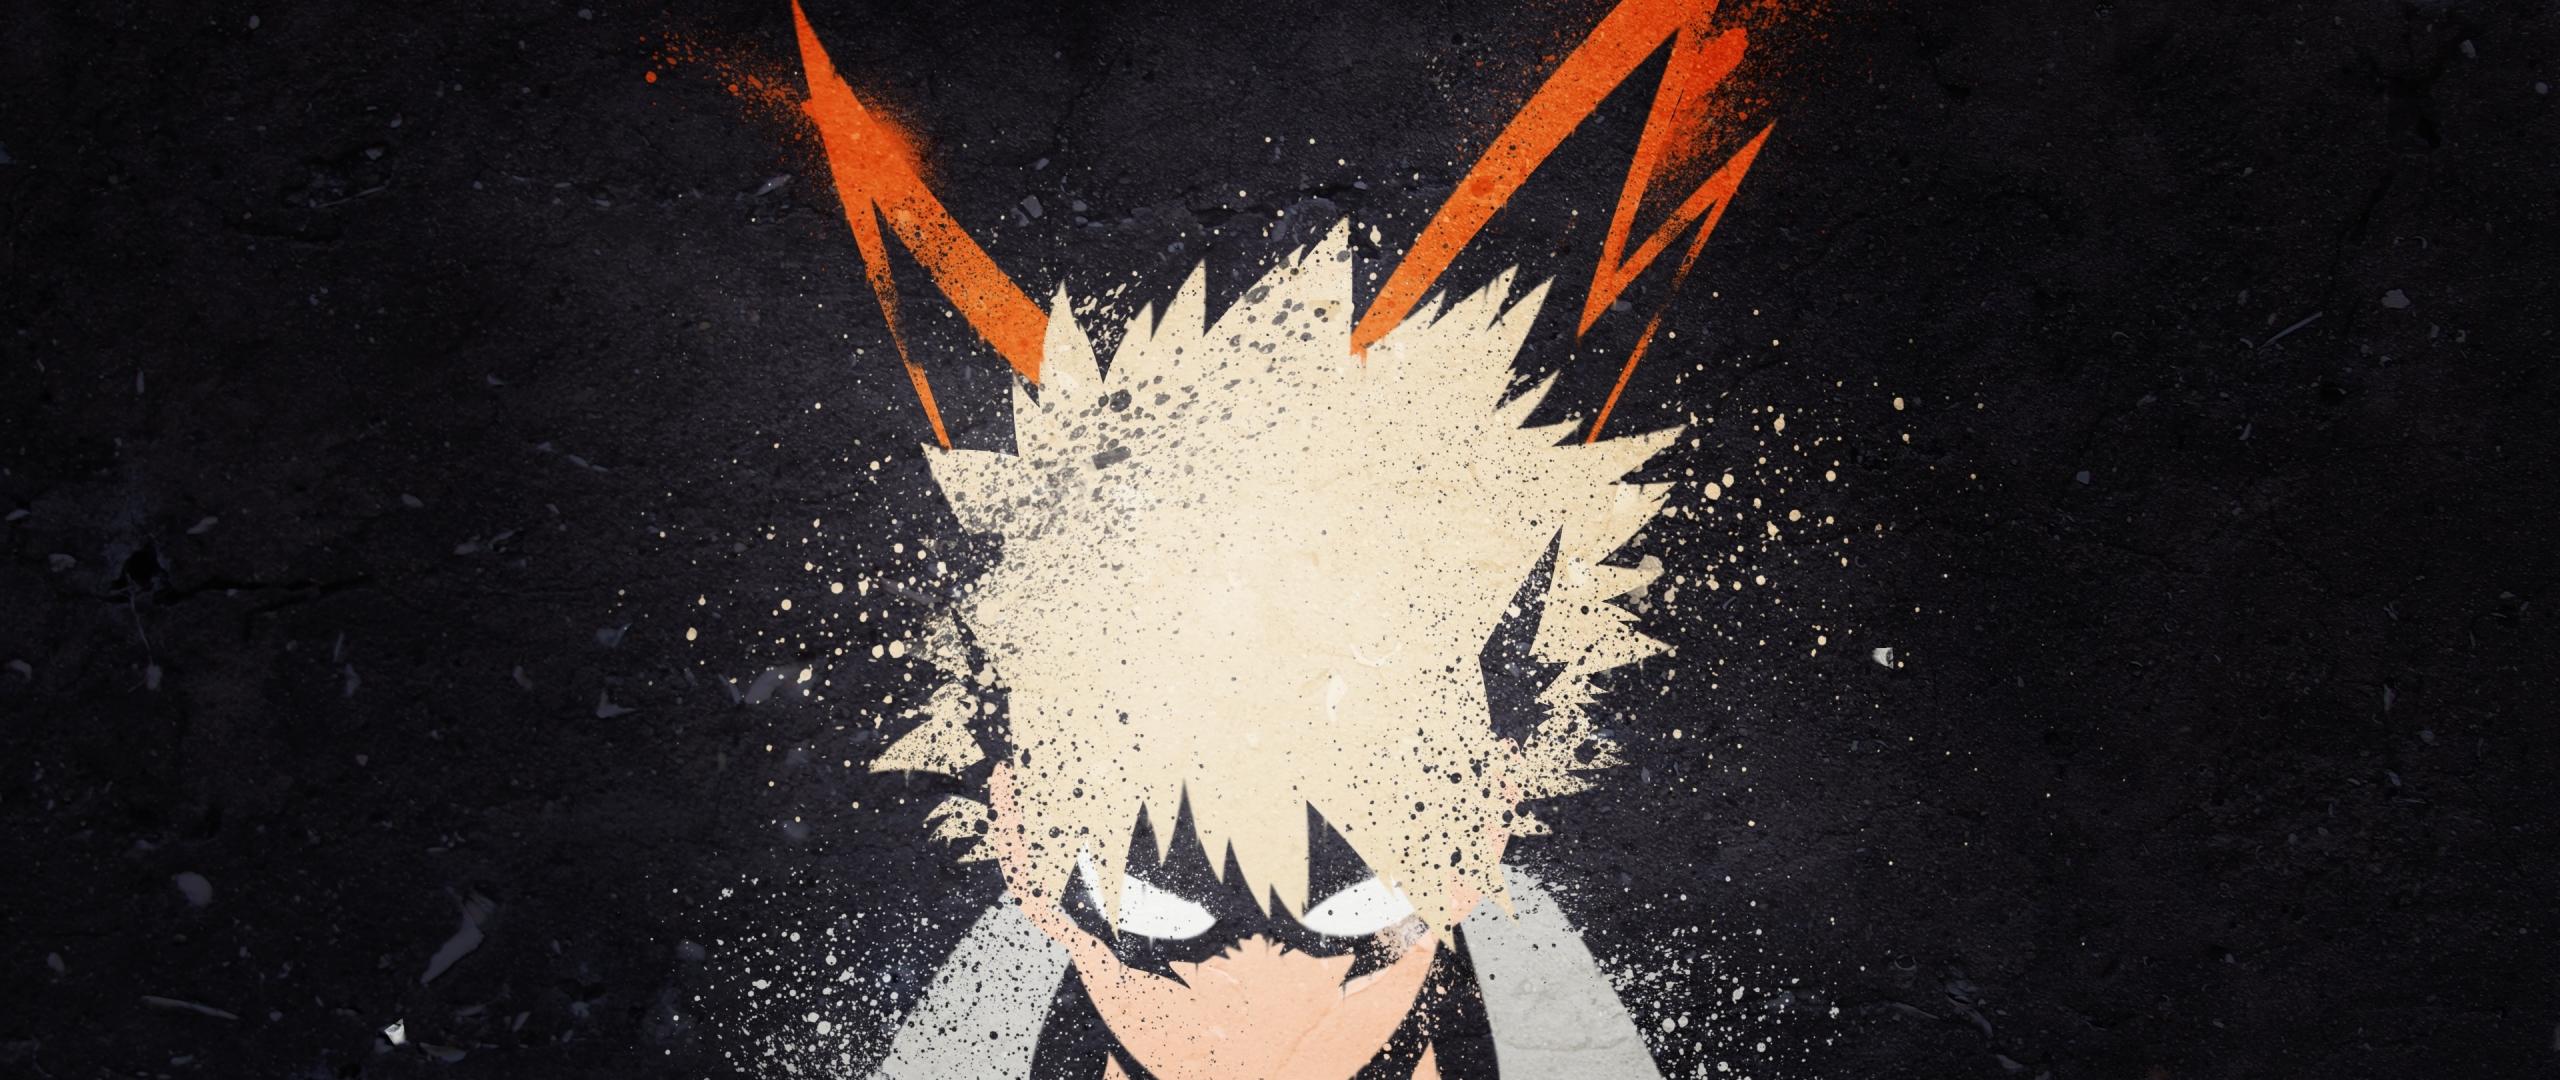 My Hero Academia Katsuki Bakugou Art Hd 4k Wallpaper